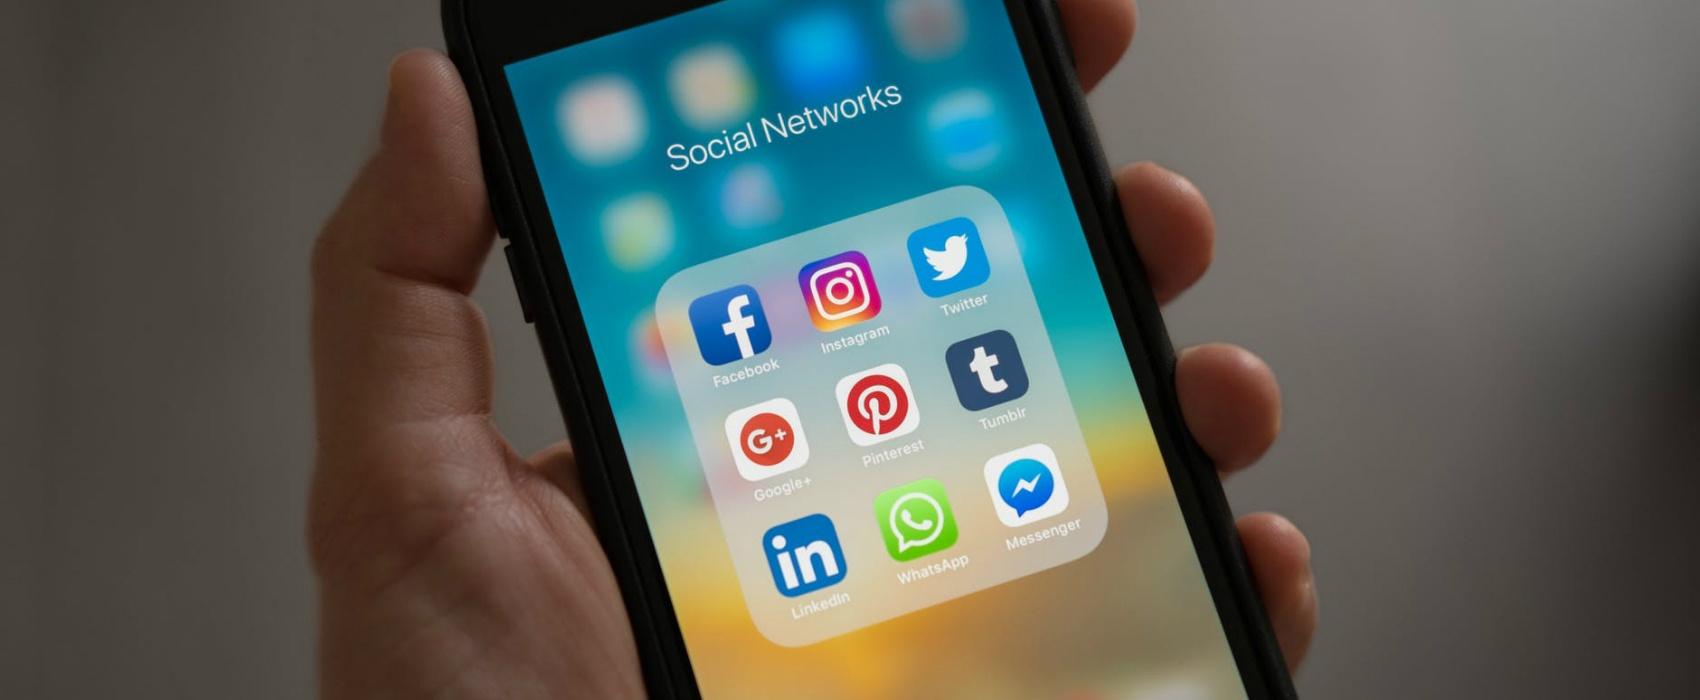 social media apps on phone display